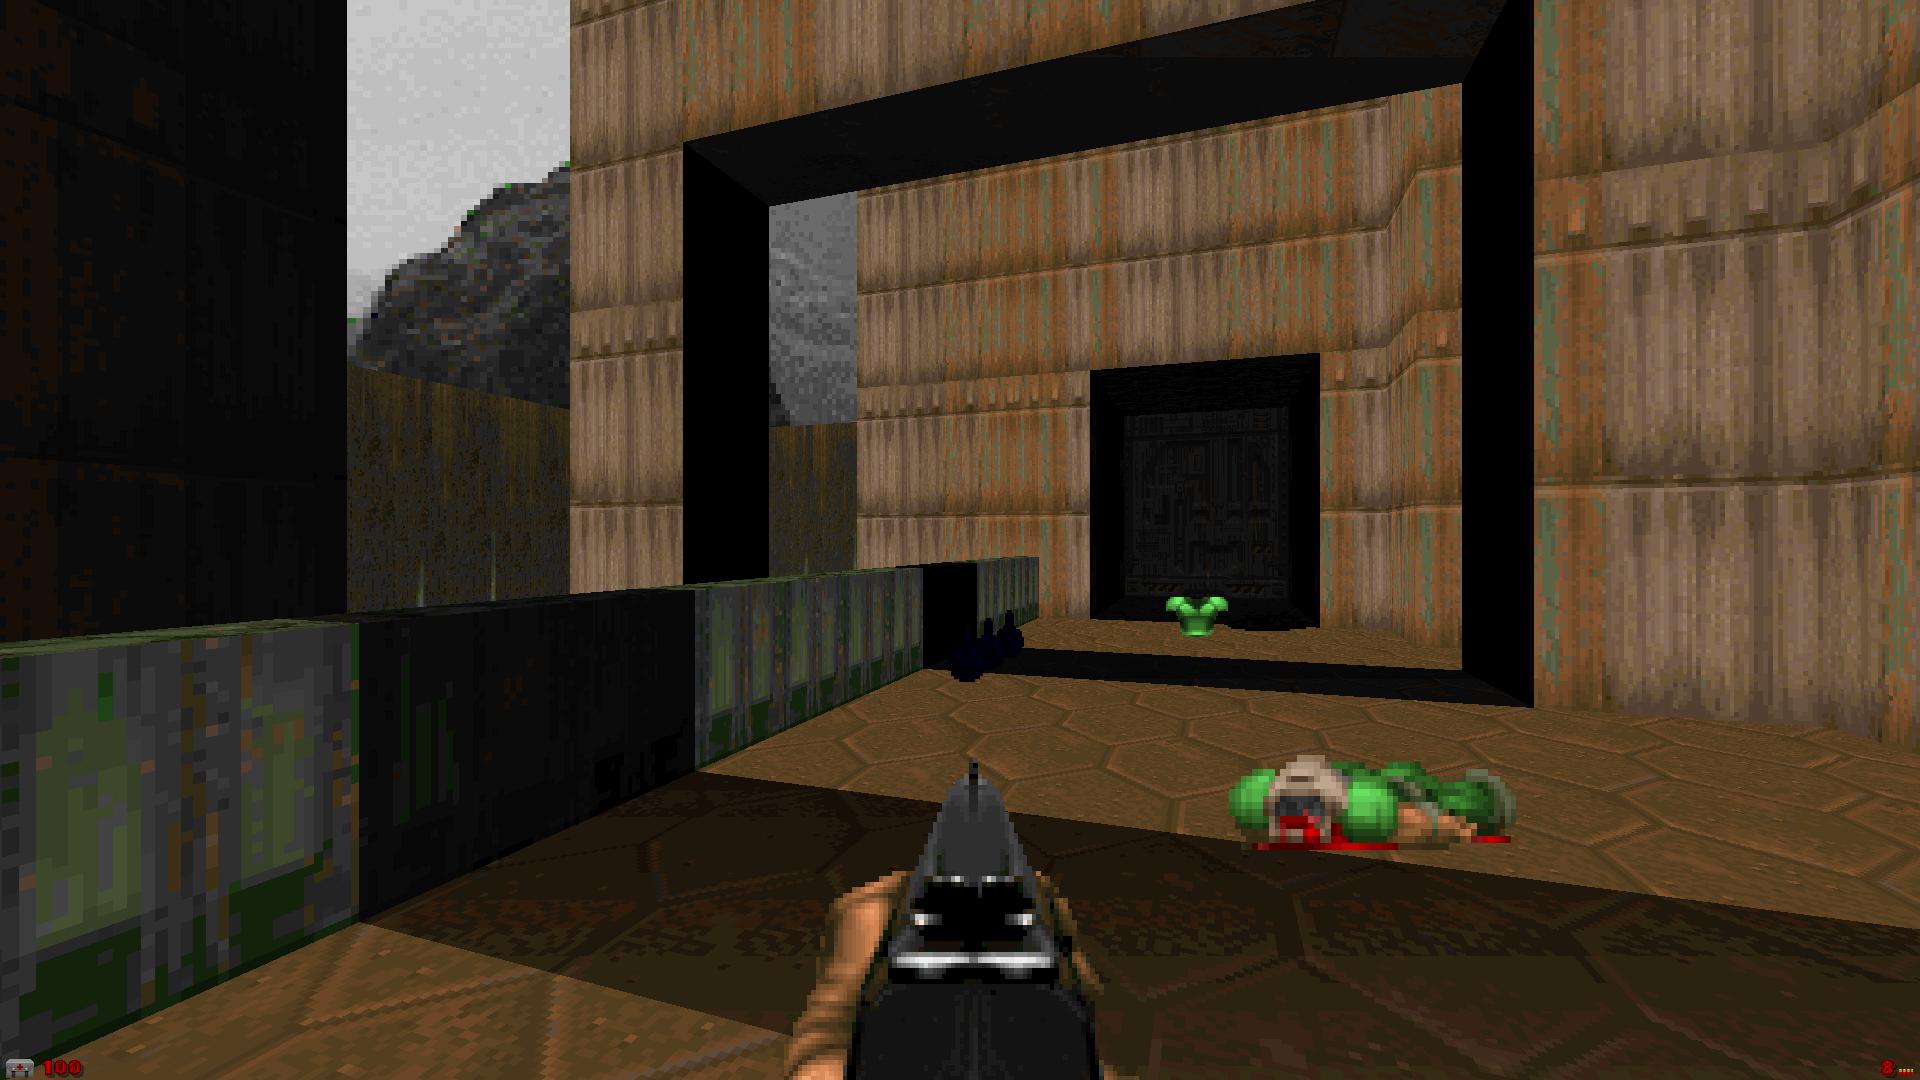 Screenshot_Doom_20181130_001540.png.cc8aa0c56aecd828be56fc9680fce582.png